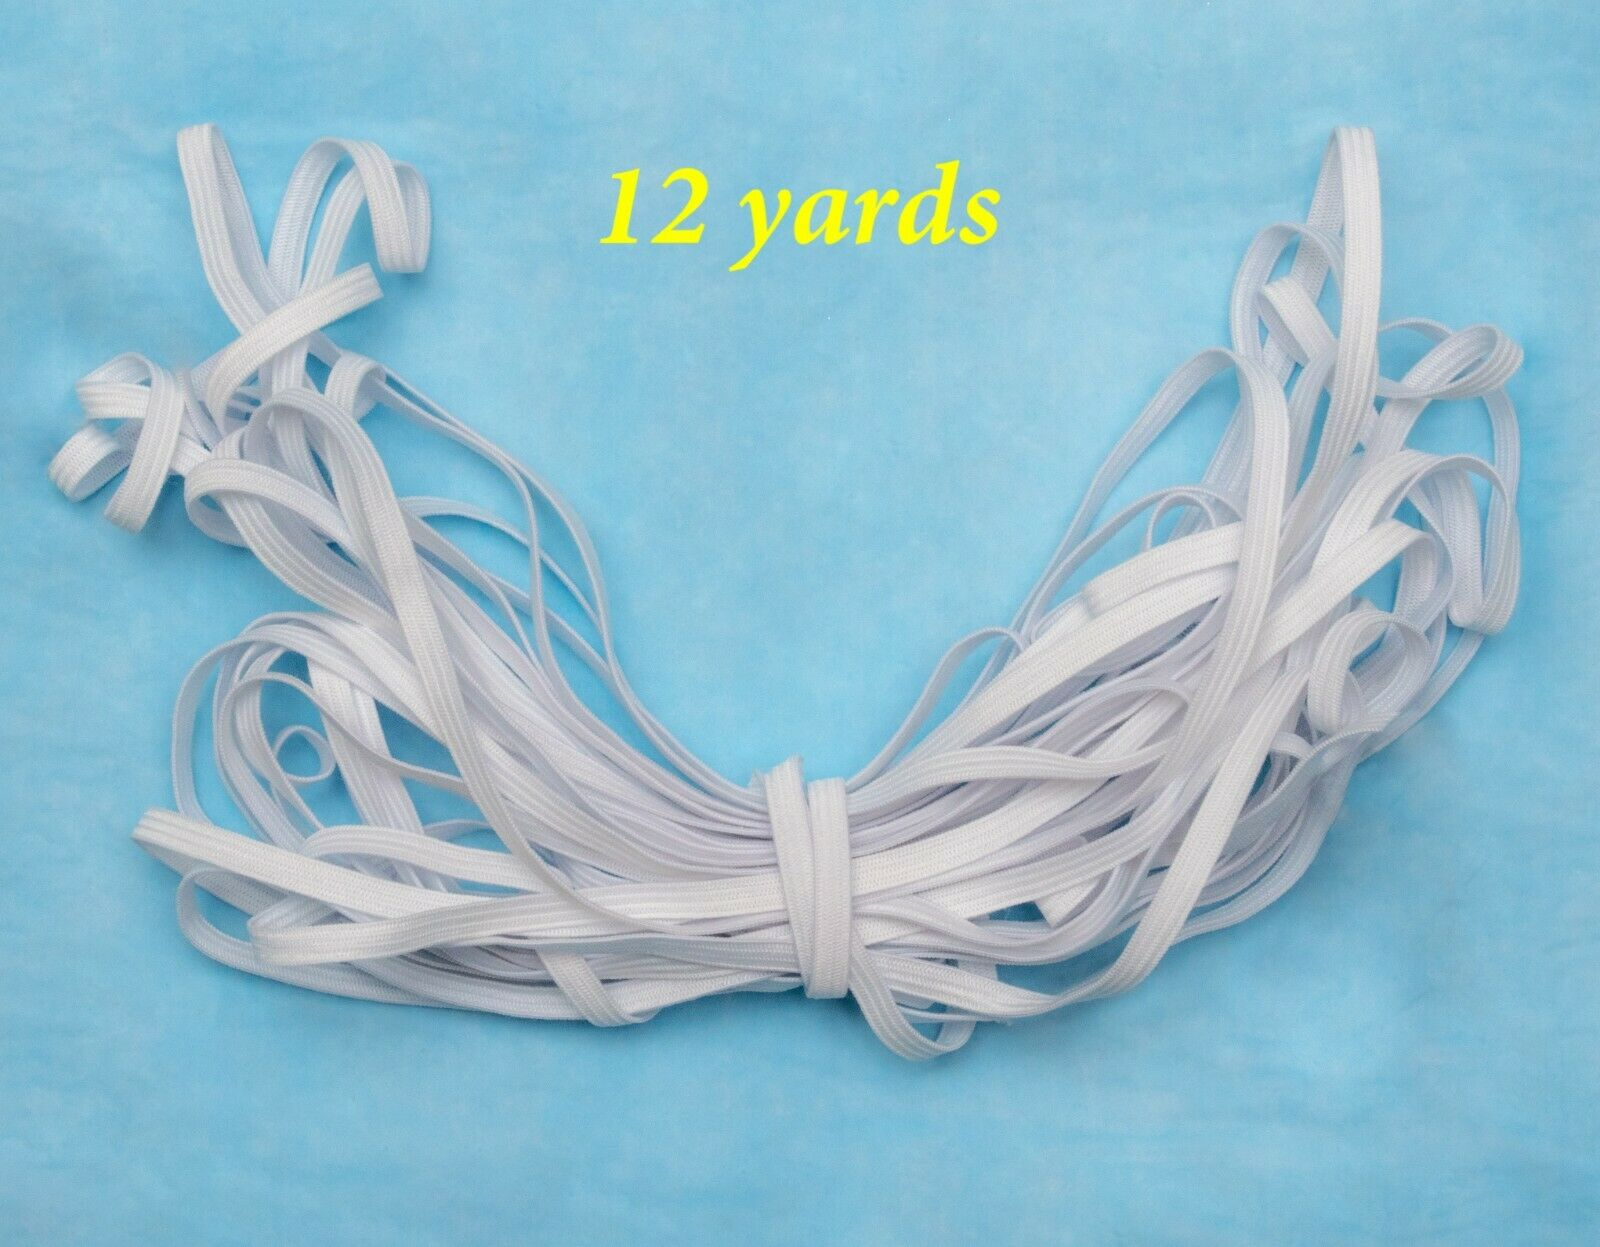 Braided White Elastic 1/4 x 12 yards